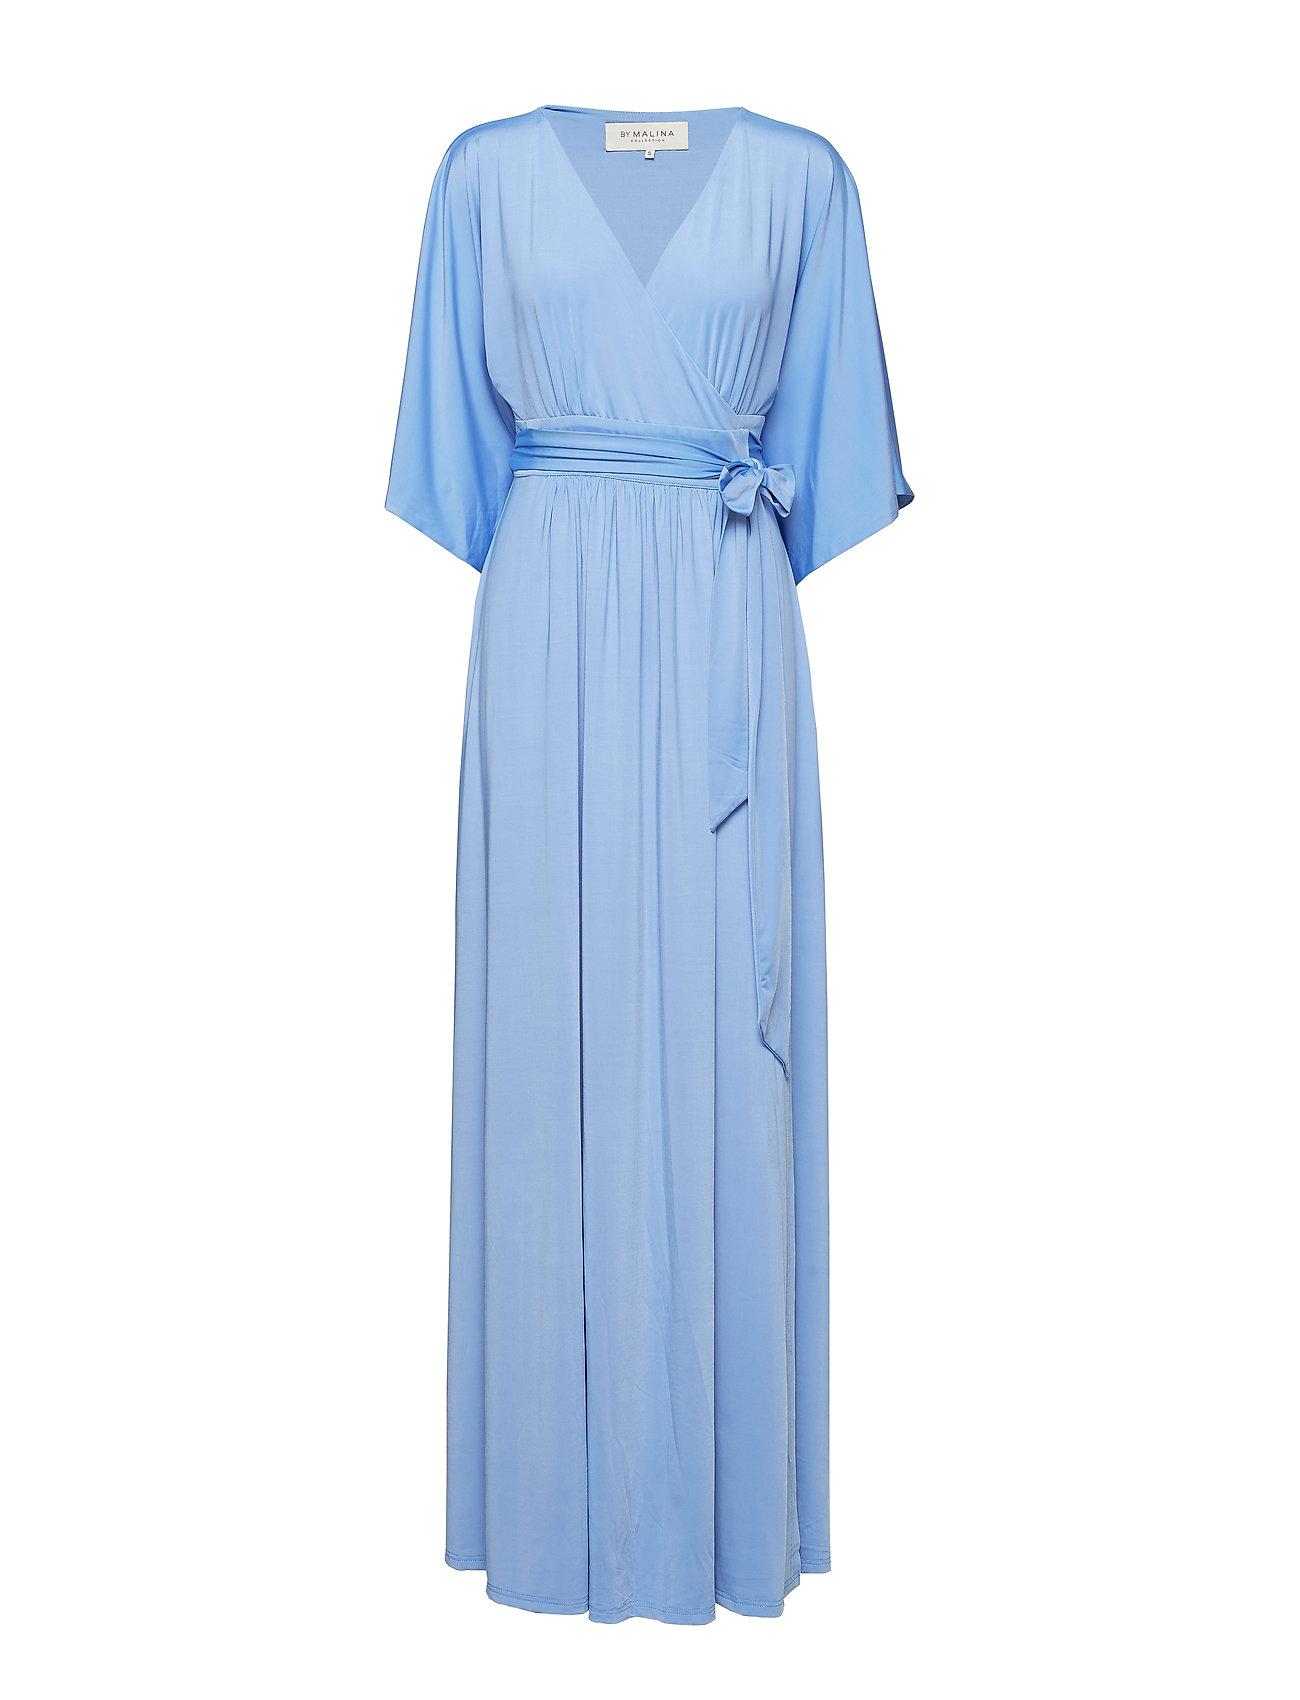 By Malina Evelynn dress - MIAMI BLUE